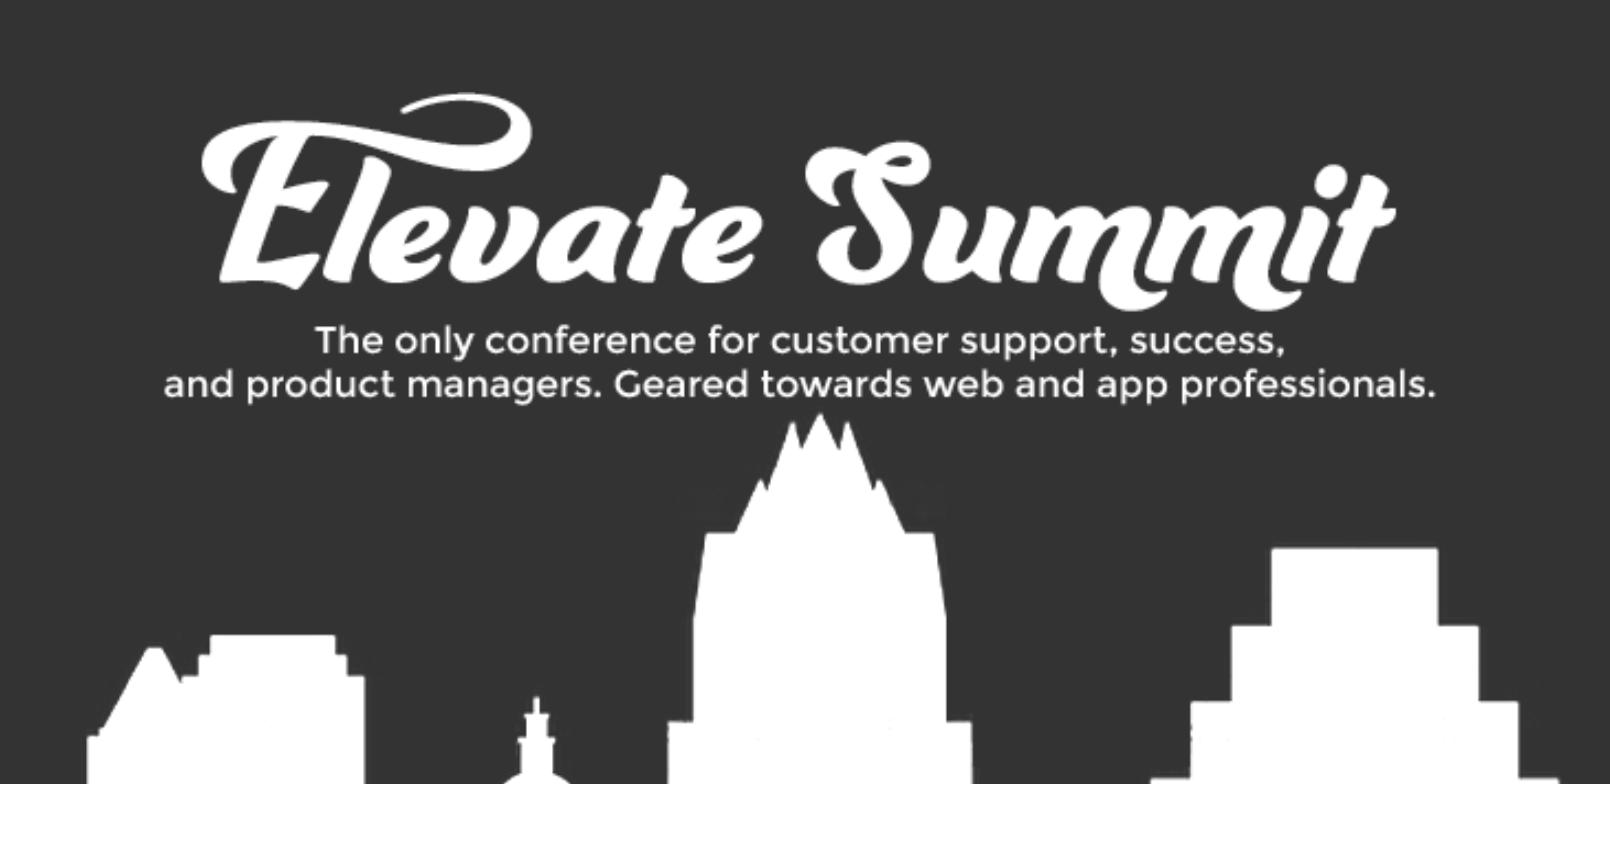 Speaker at Customer Support event | Austin, TX